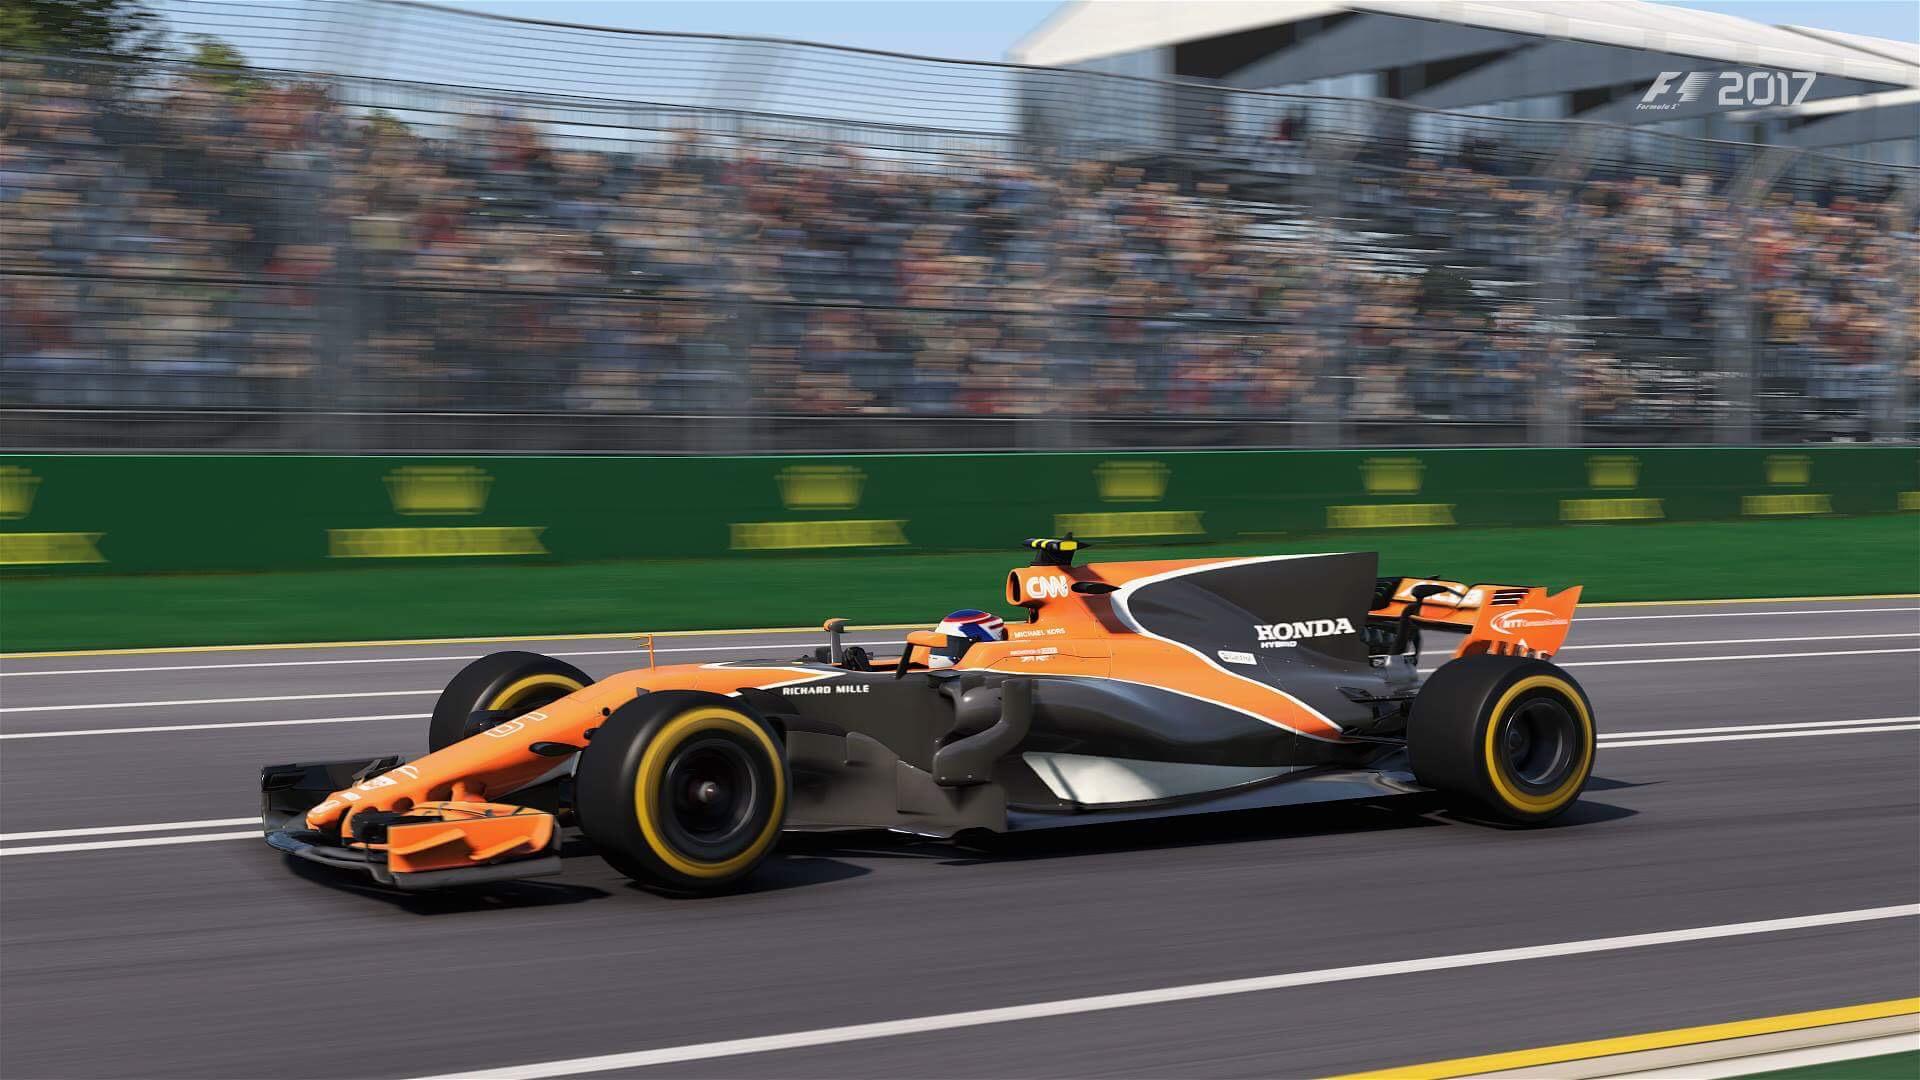 F1 2017 graphics settings PC | RaceDepartment